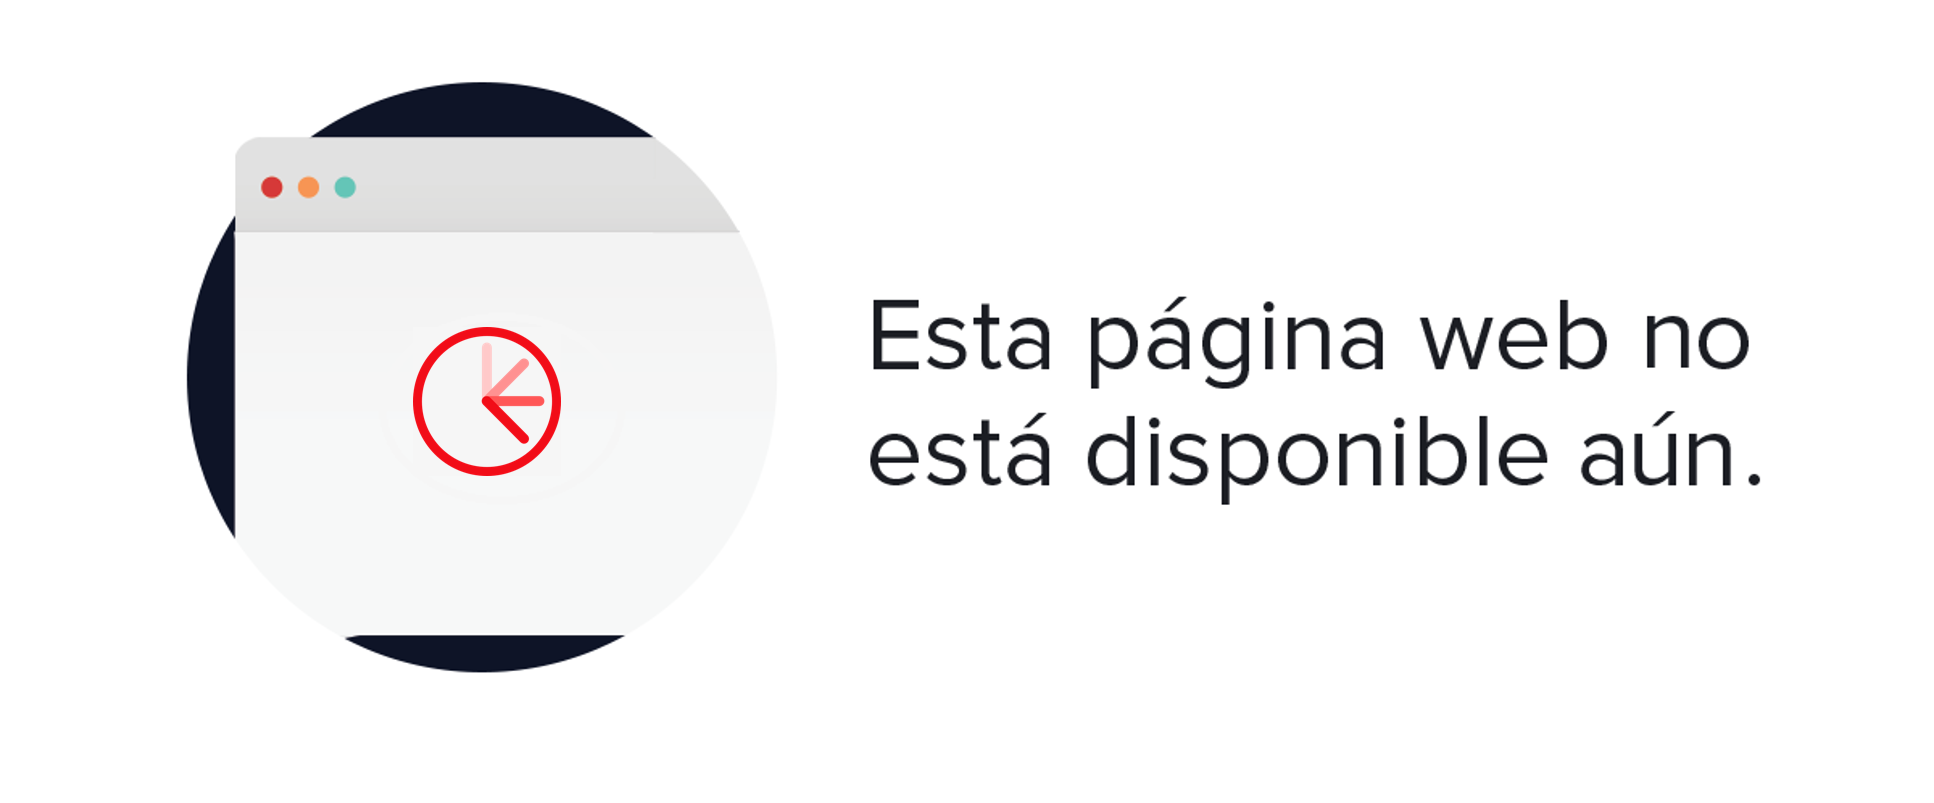 Aretina - Impuls Mocasin casual tipo guante - Café - 145470 - RMIMGJF Mocasines Hombre